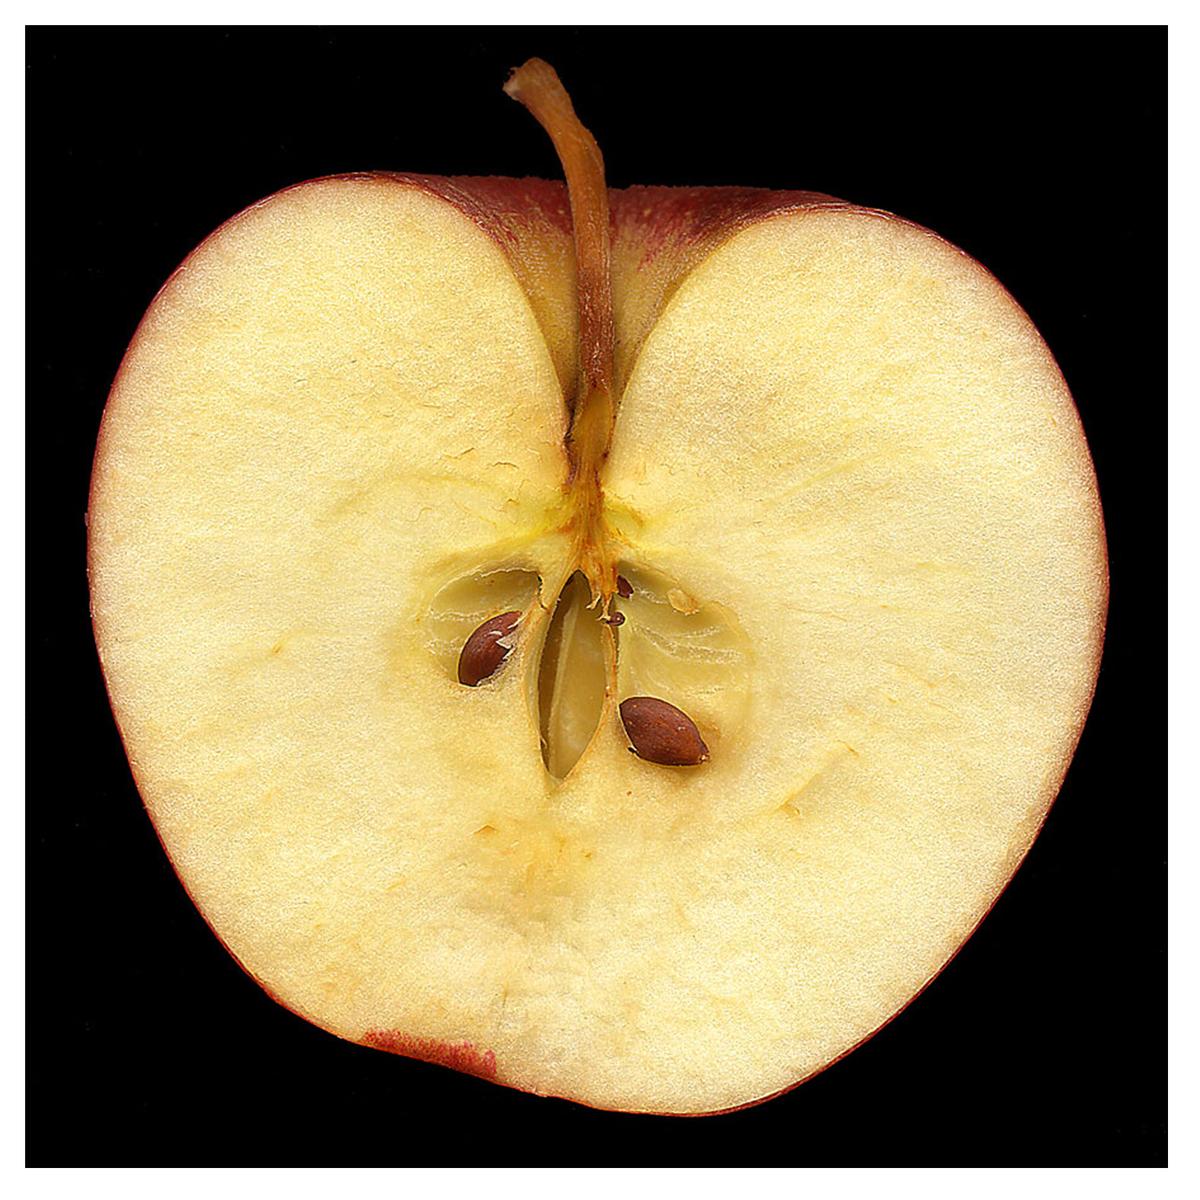 Apple Half (large view)